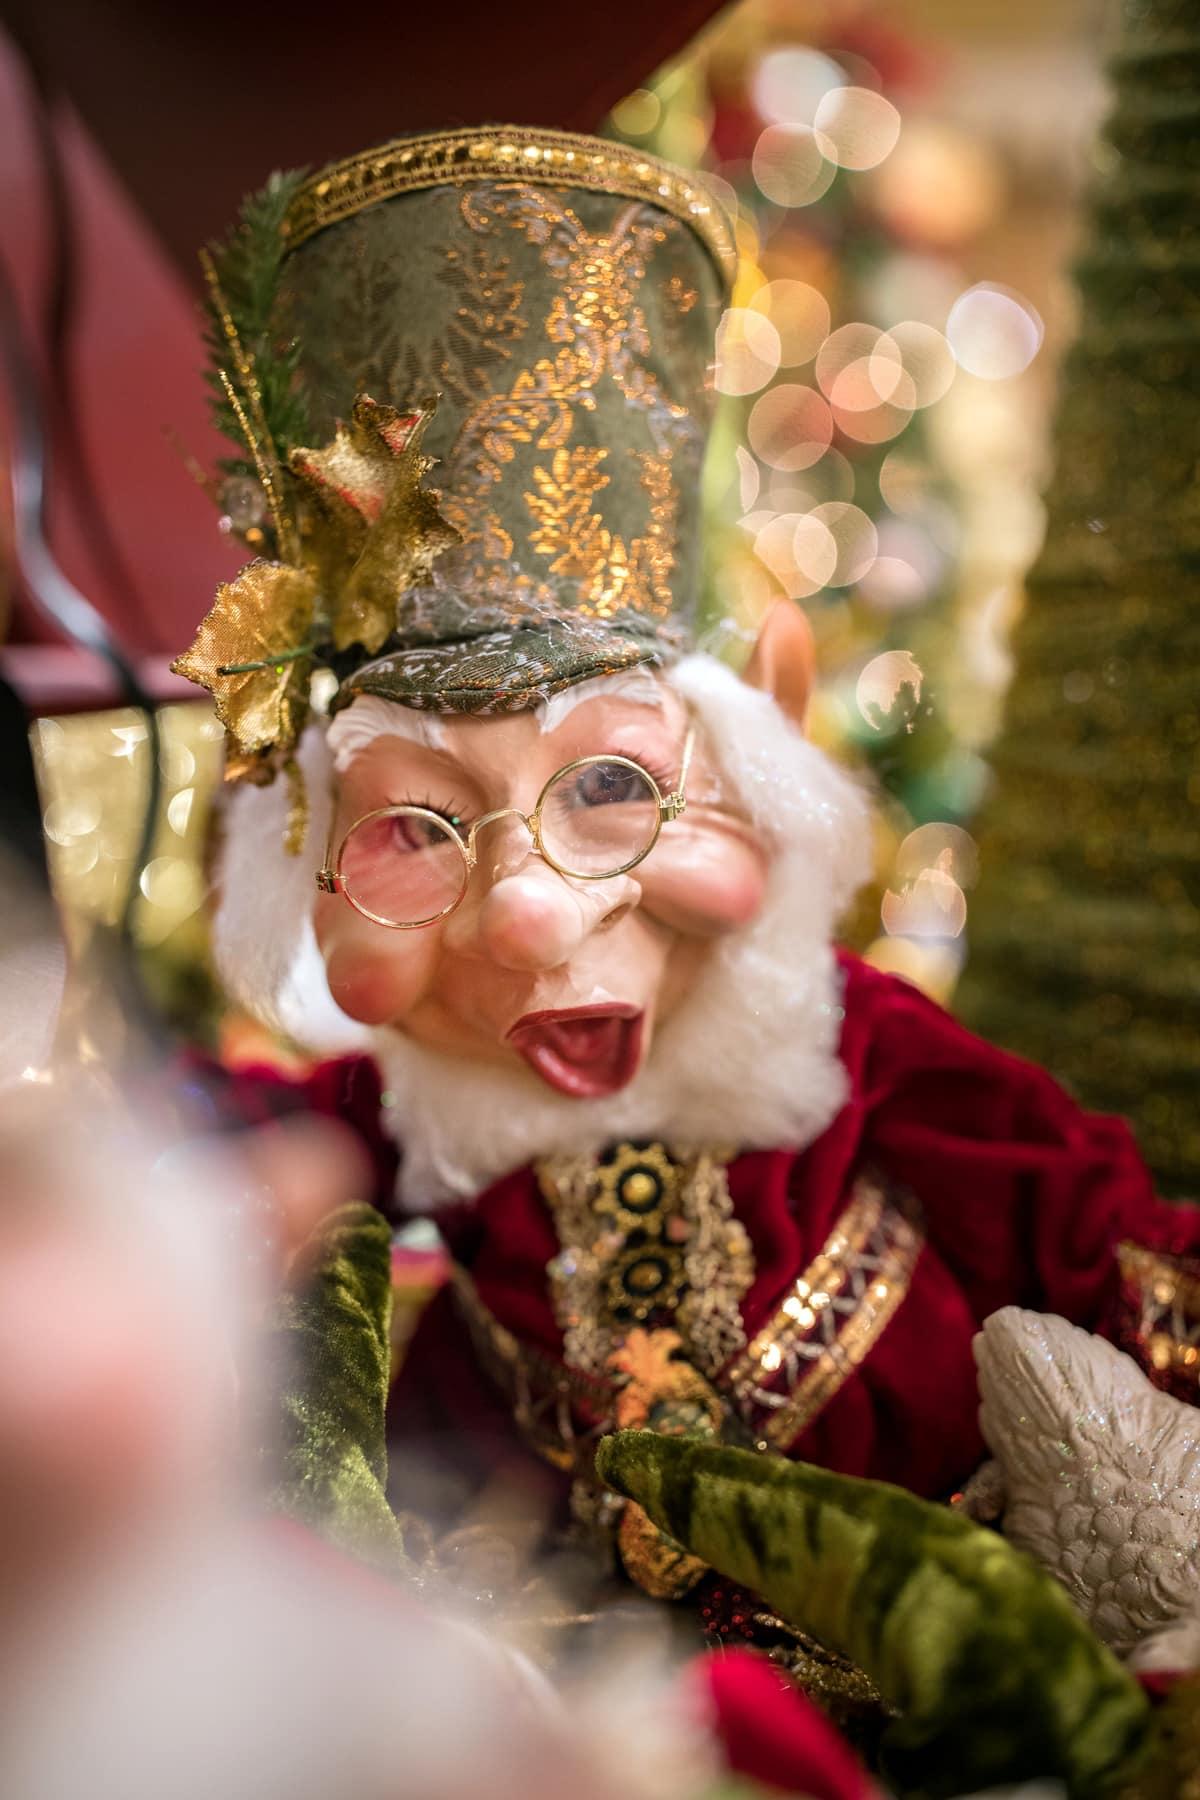 Mark Roberts Holiday Elves 2